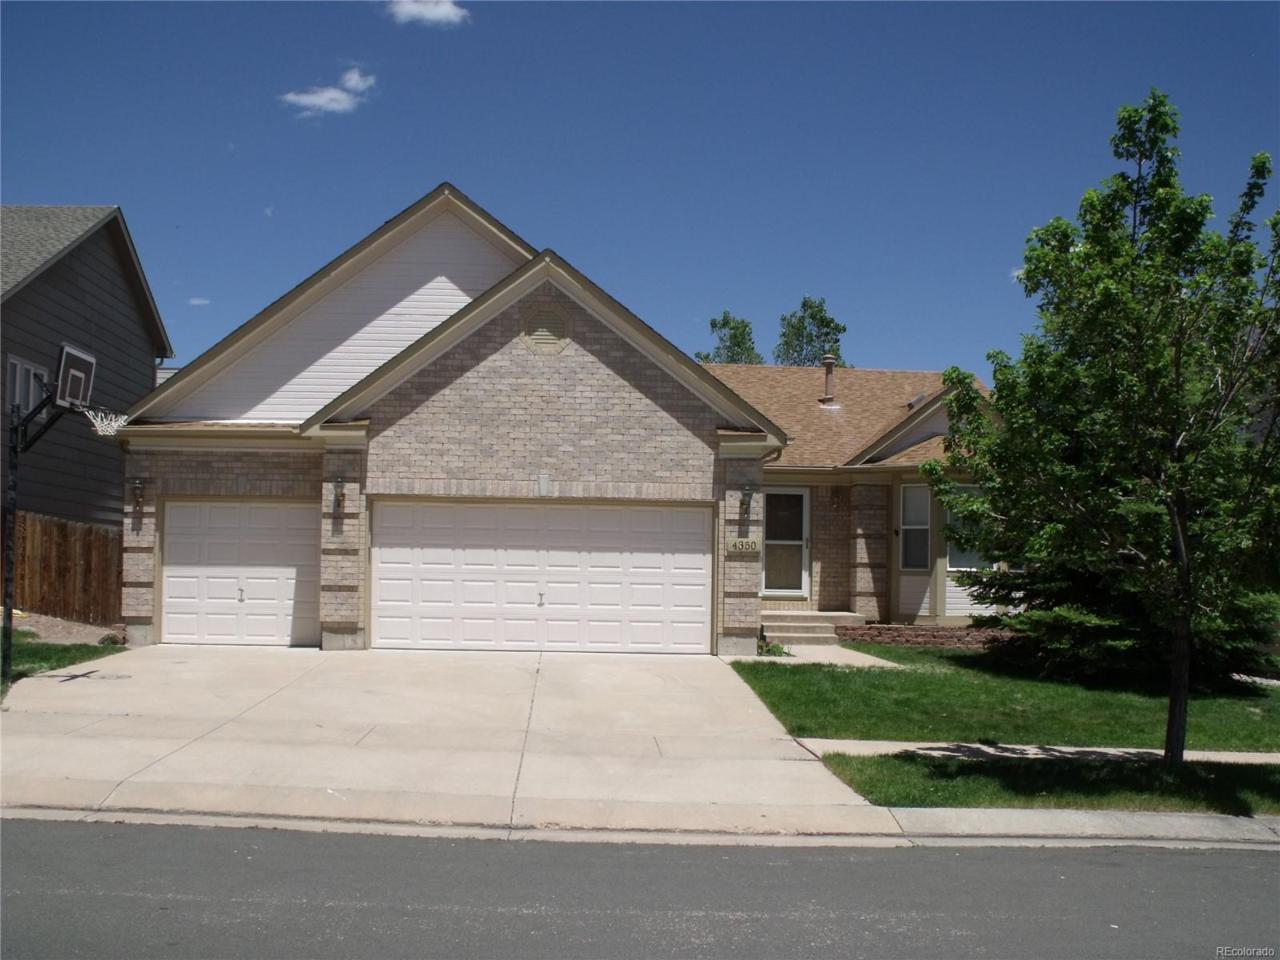 4350 Morning Glory Road, Colorado Springs, CO 80920 (MLS #4305911) :: 8z Real Estate